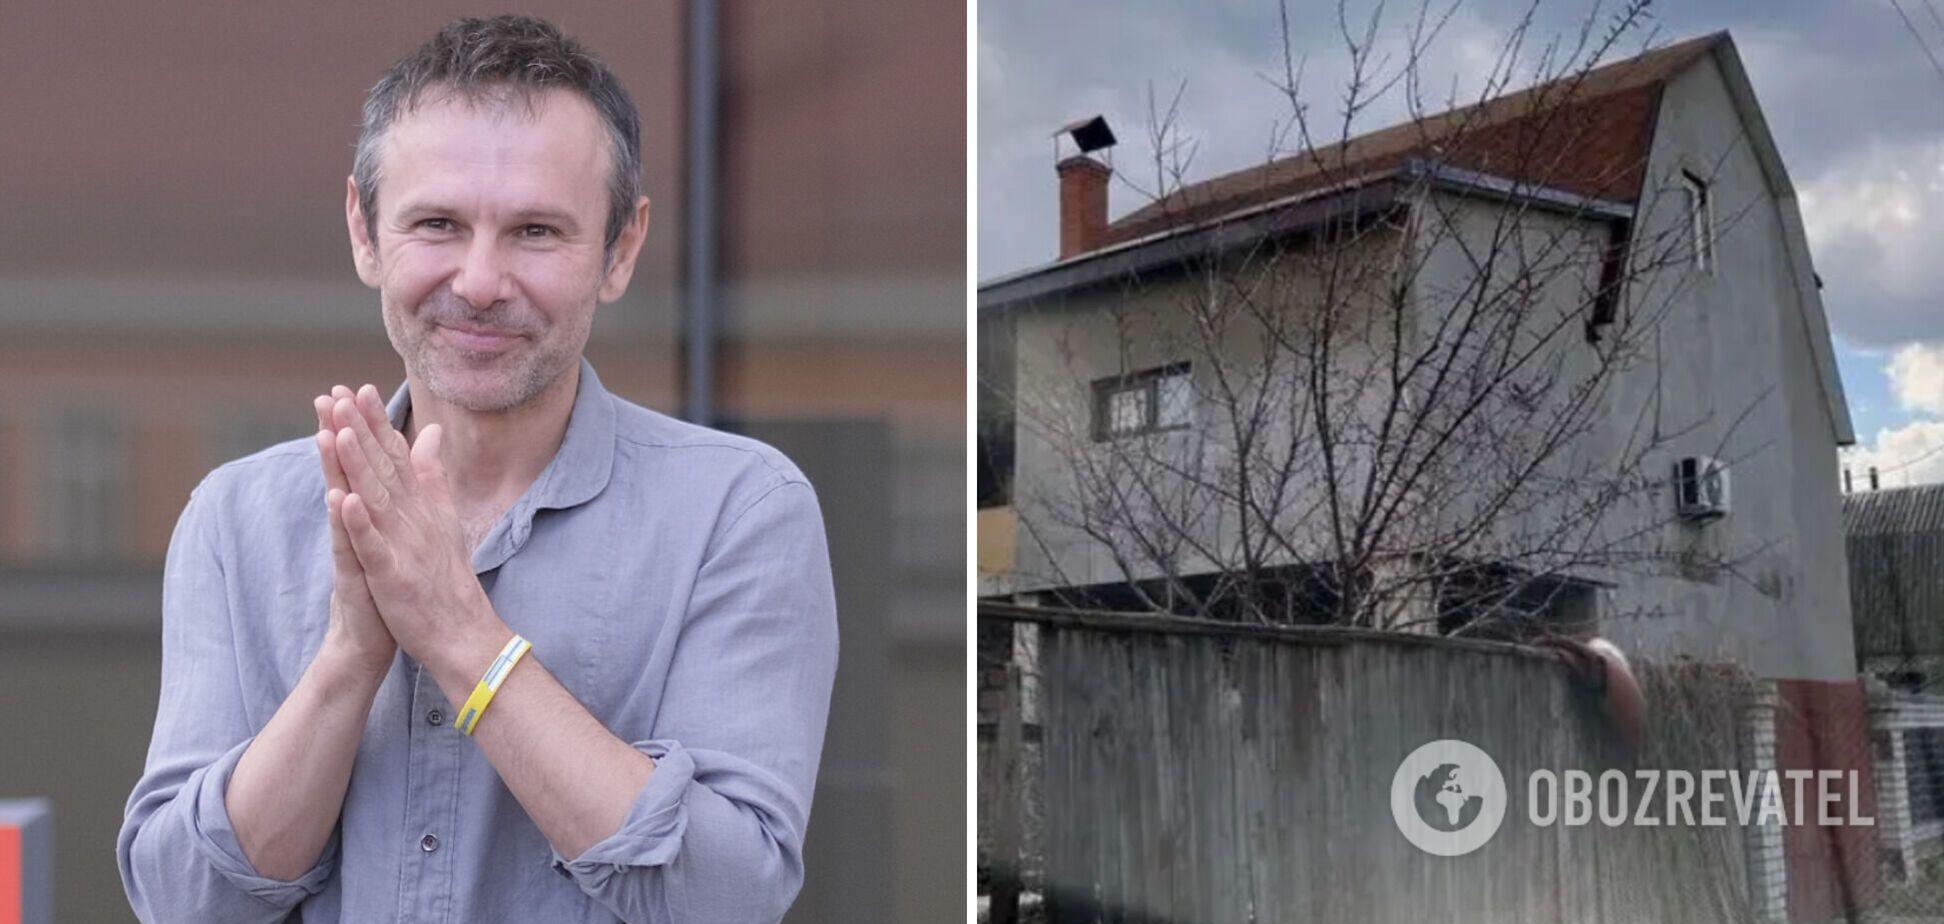 Лідер гурту 'Океан Ельзи' Святослав Вакарчук